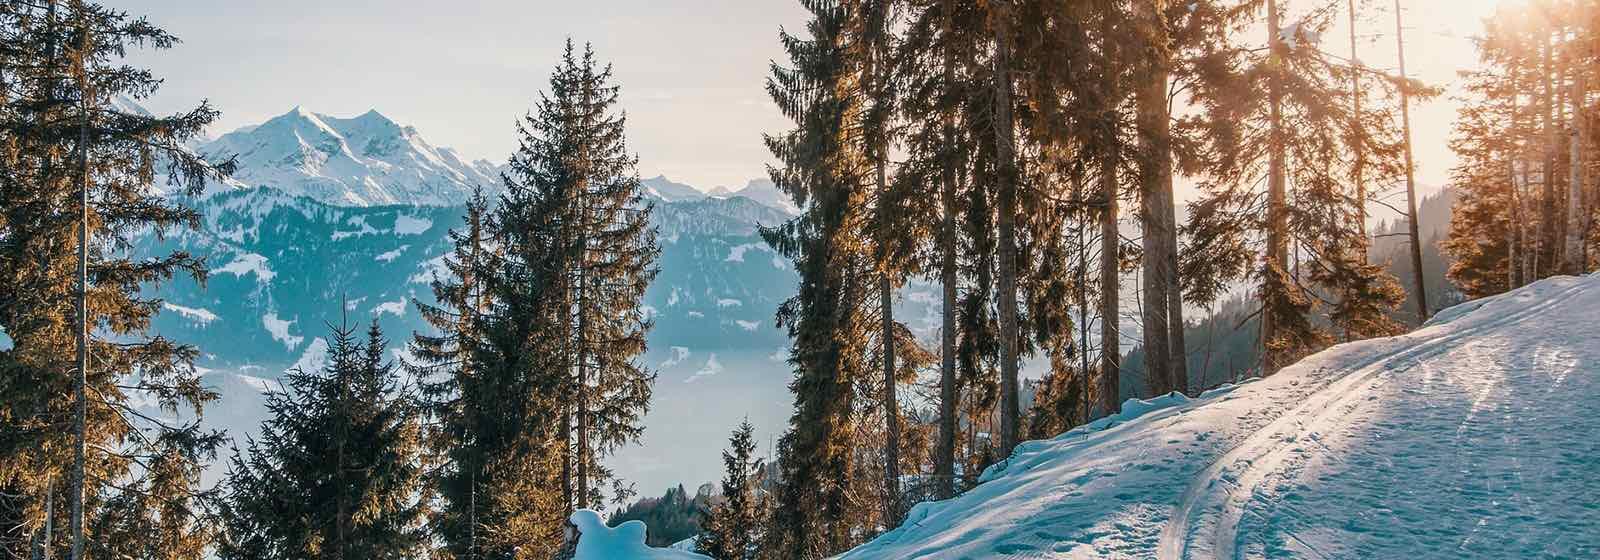 KWL im Winter